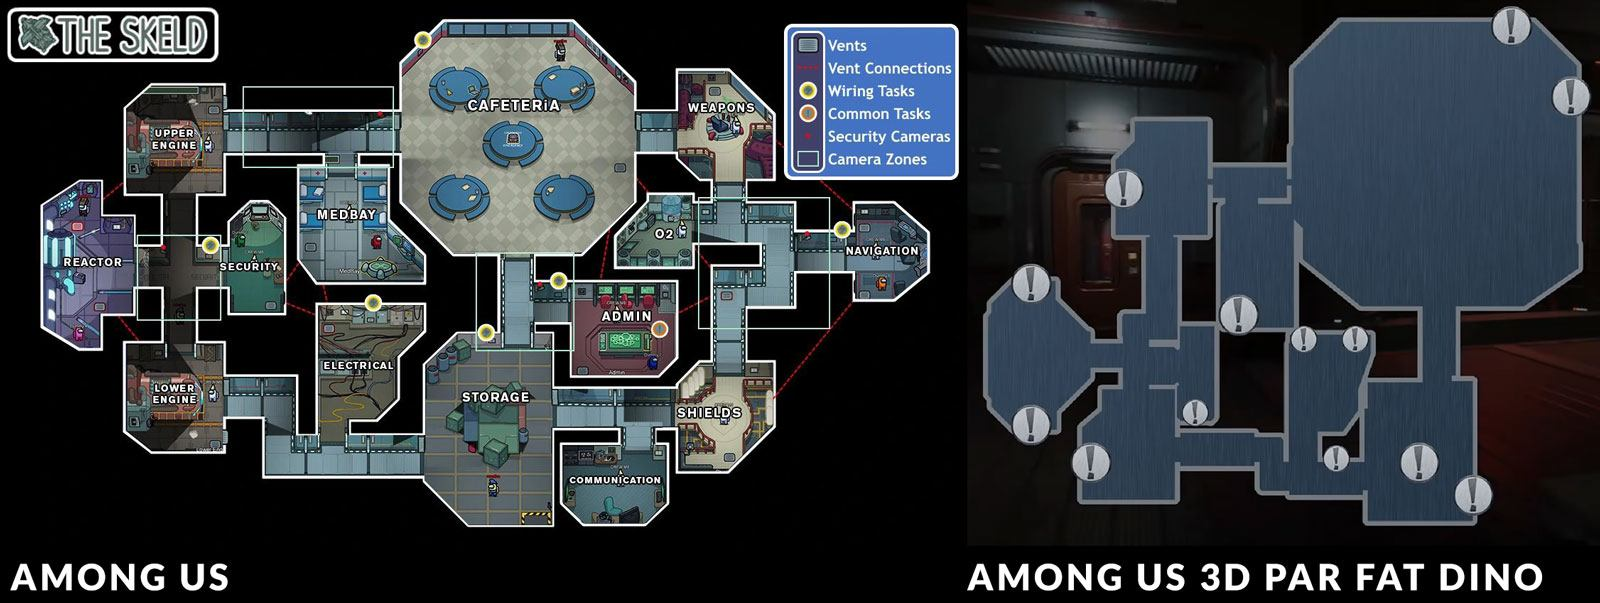 Map d'Among Us 3D